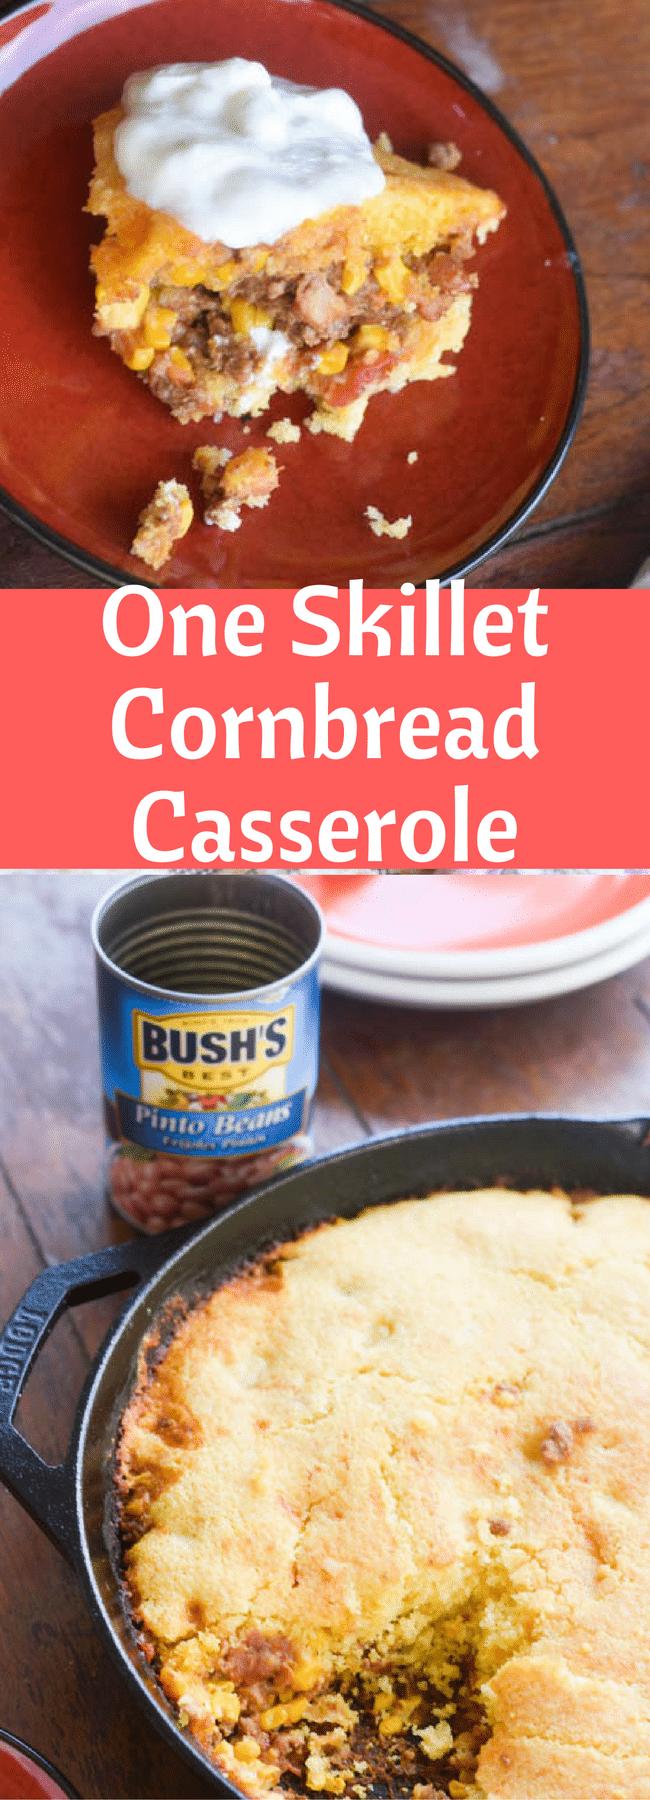 One Skillet Cornbread Casserole / Cornbread / Southwest Casserole / One Skillet Meal / One Pot Meal / Tamale Pie via @clarkscondensed